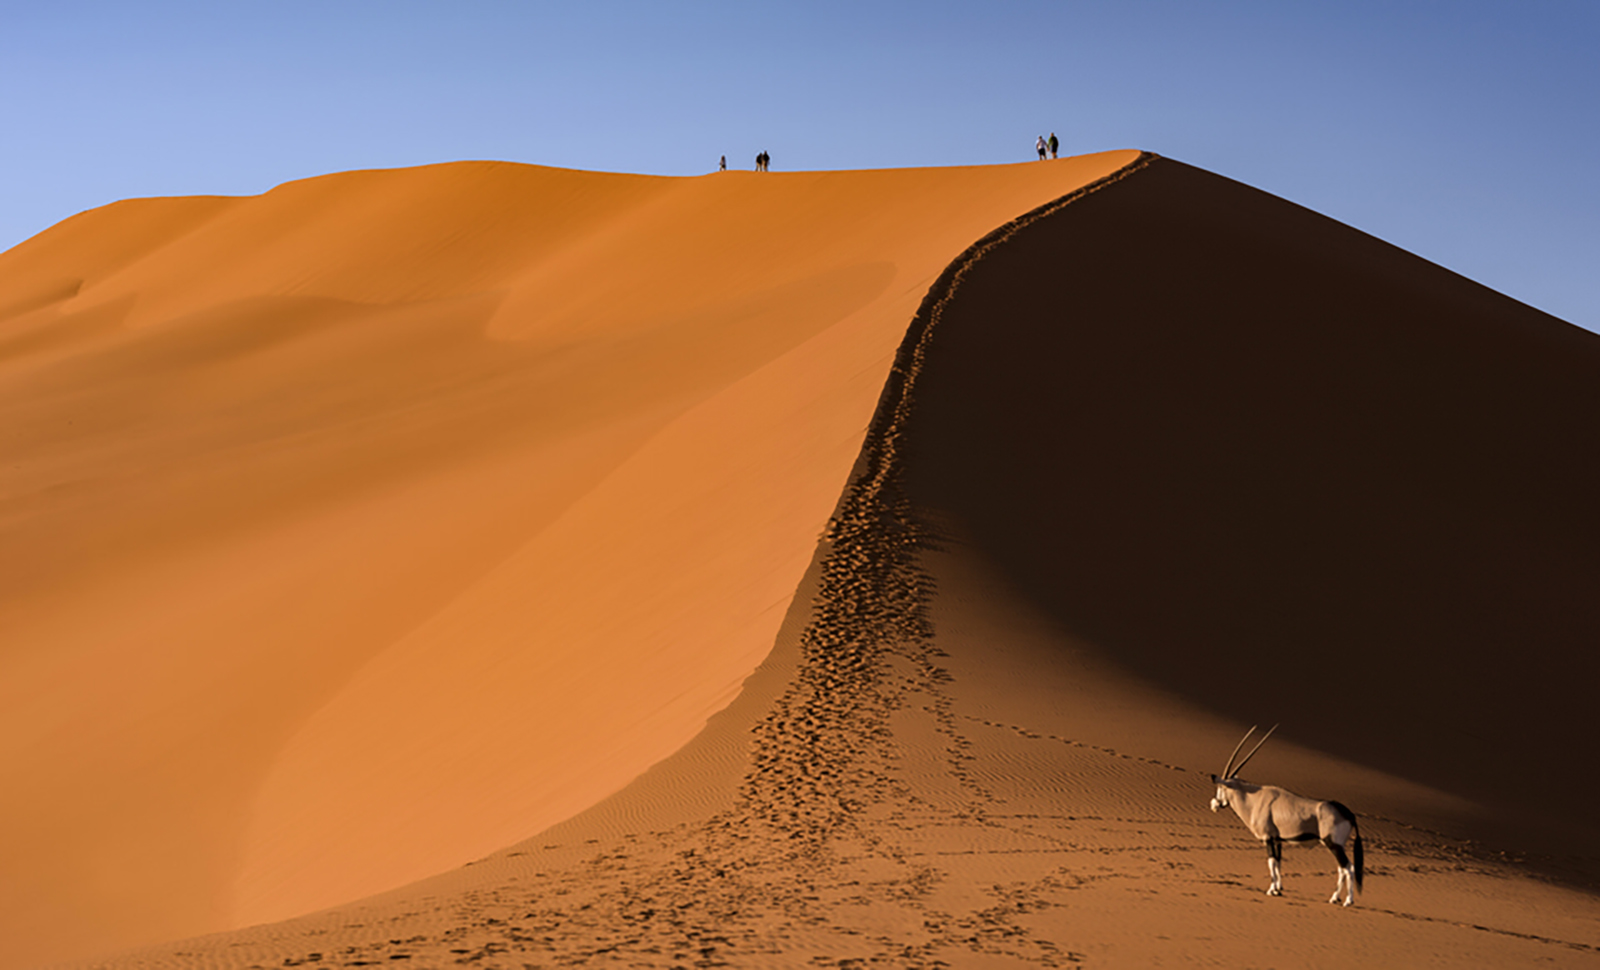 Namibia-Desert-Africa-Dunes-BigDaddy-Sossusvlei